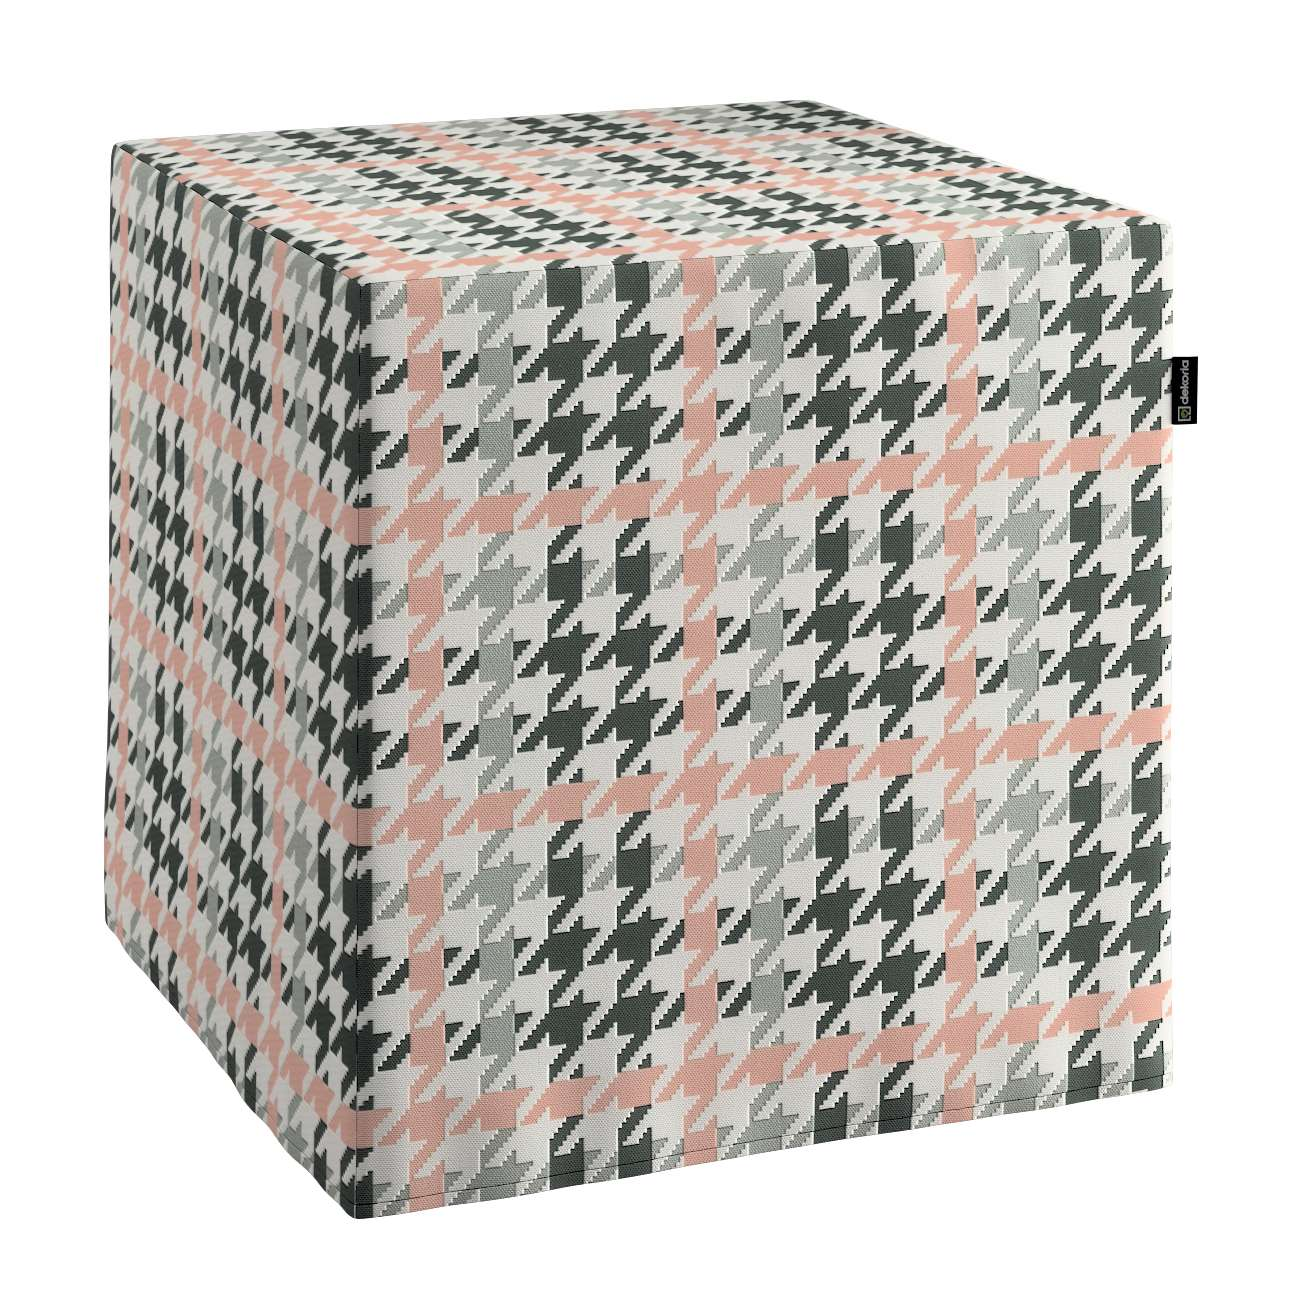 Taburetka tvrdá, kocka V kolekcii Výpredaj, tkanina: 137-75